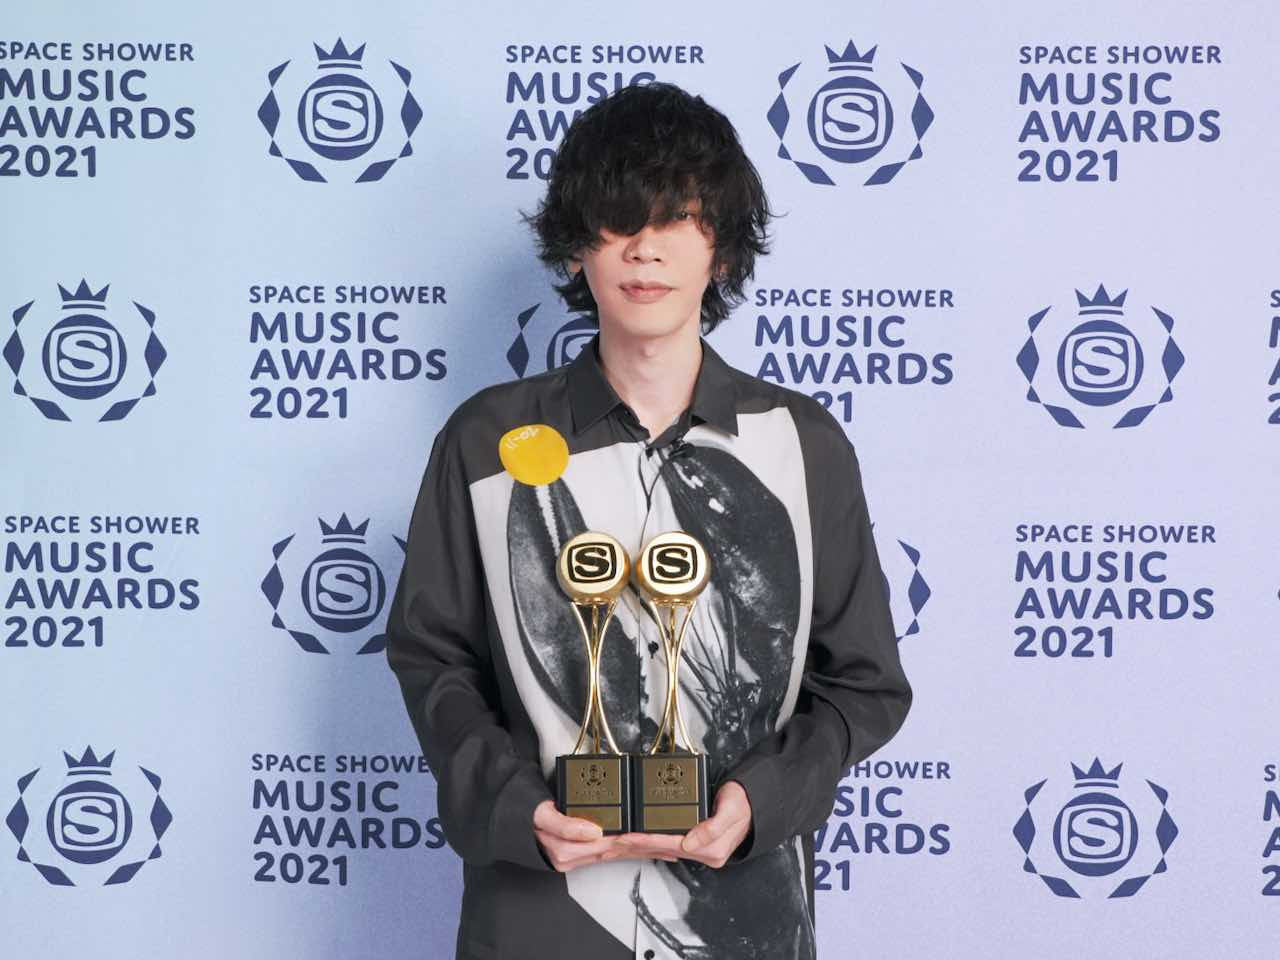 米津玄師、「SPACE SHOWER MUSIC AWARDS 2021」2部門受賞!